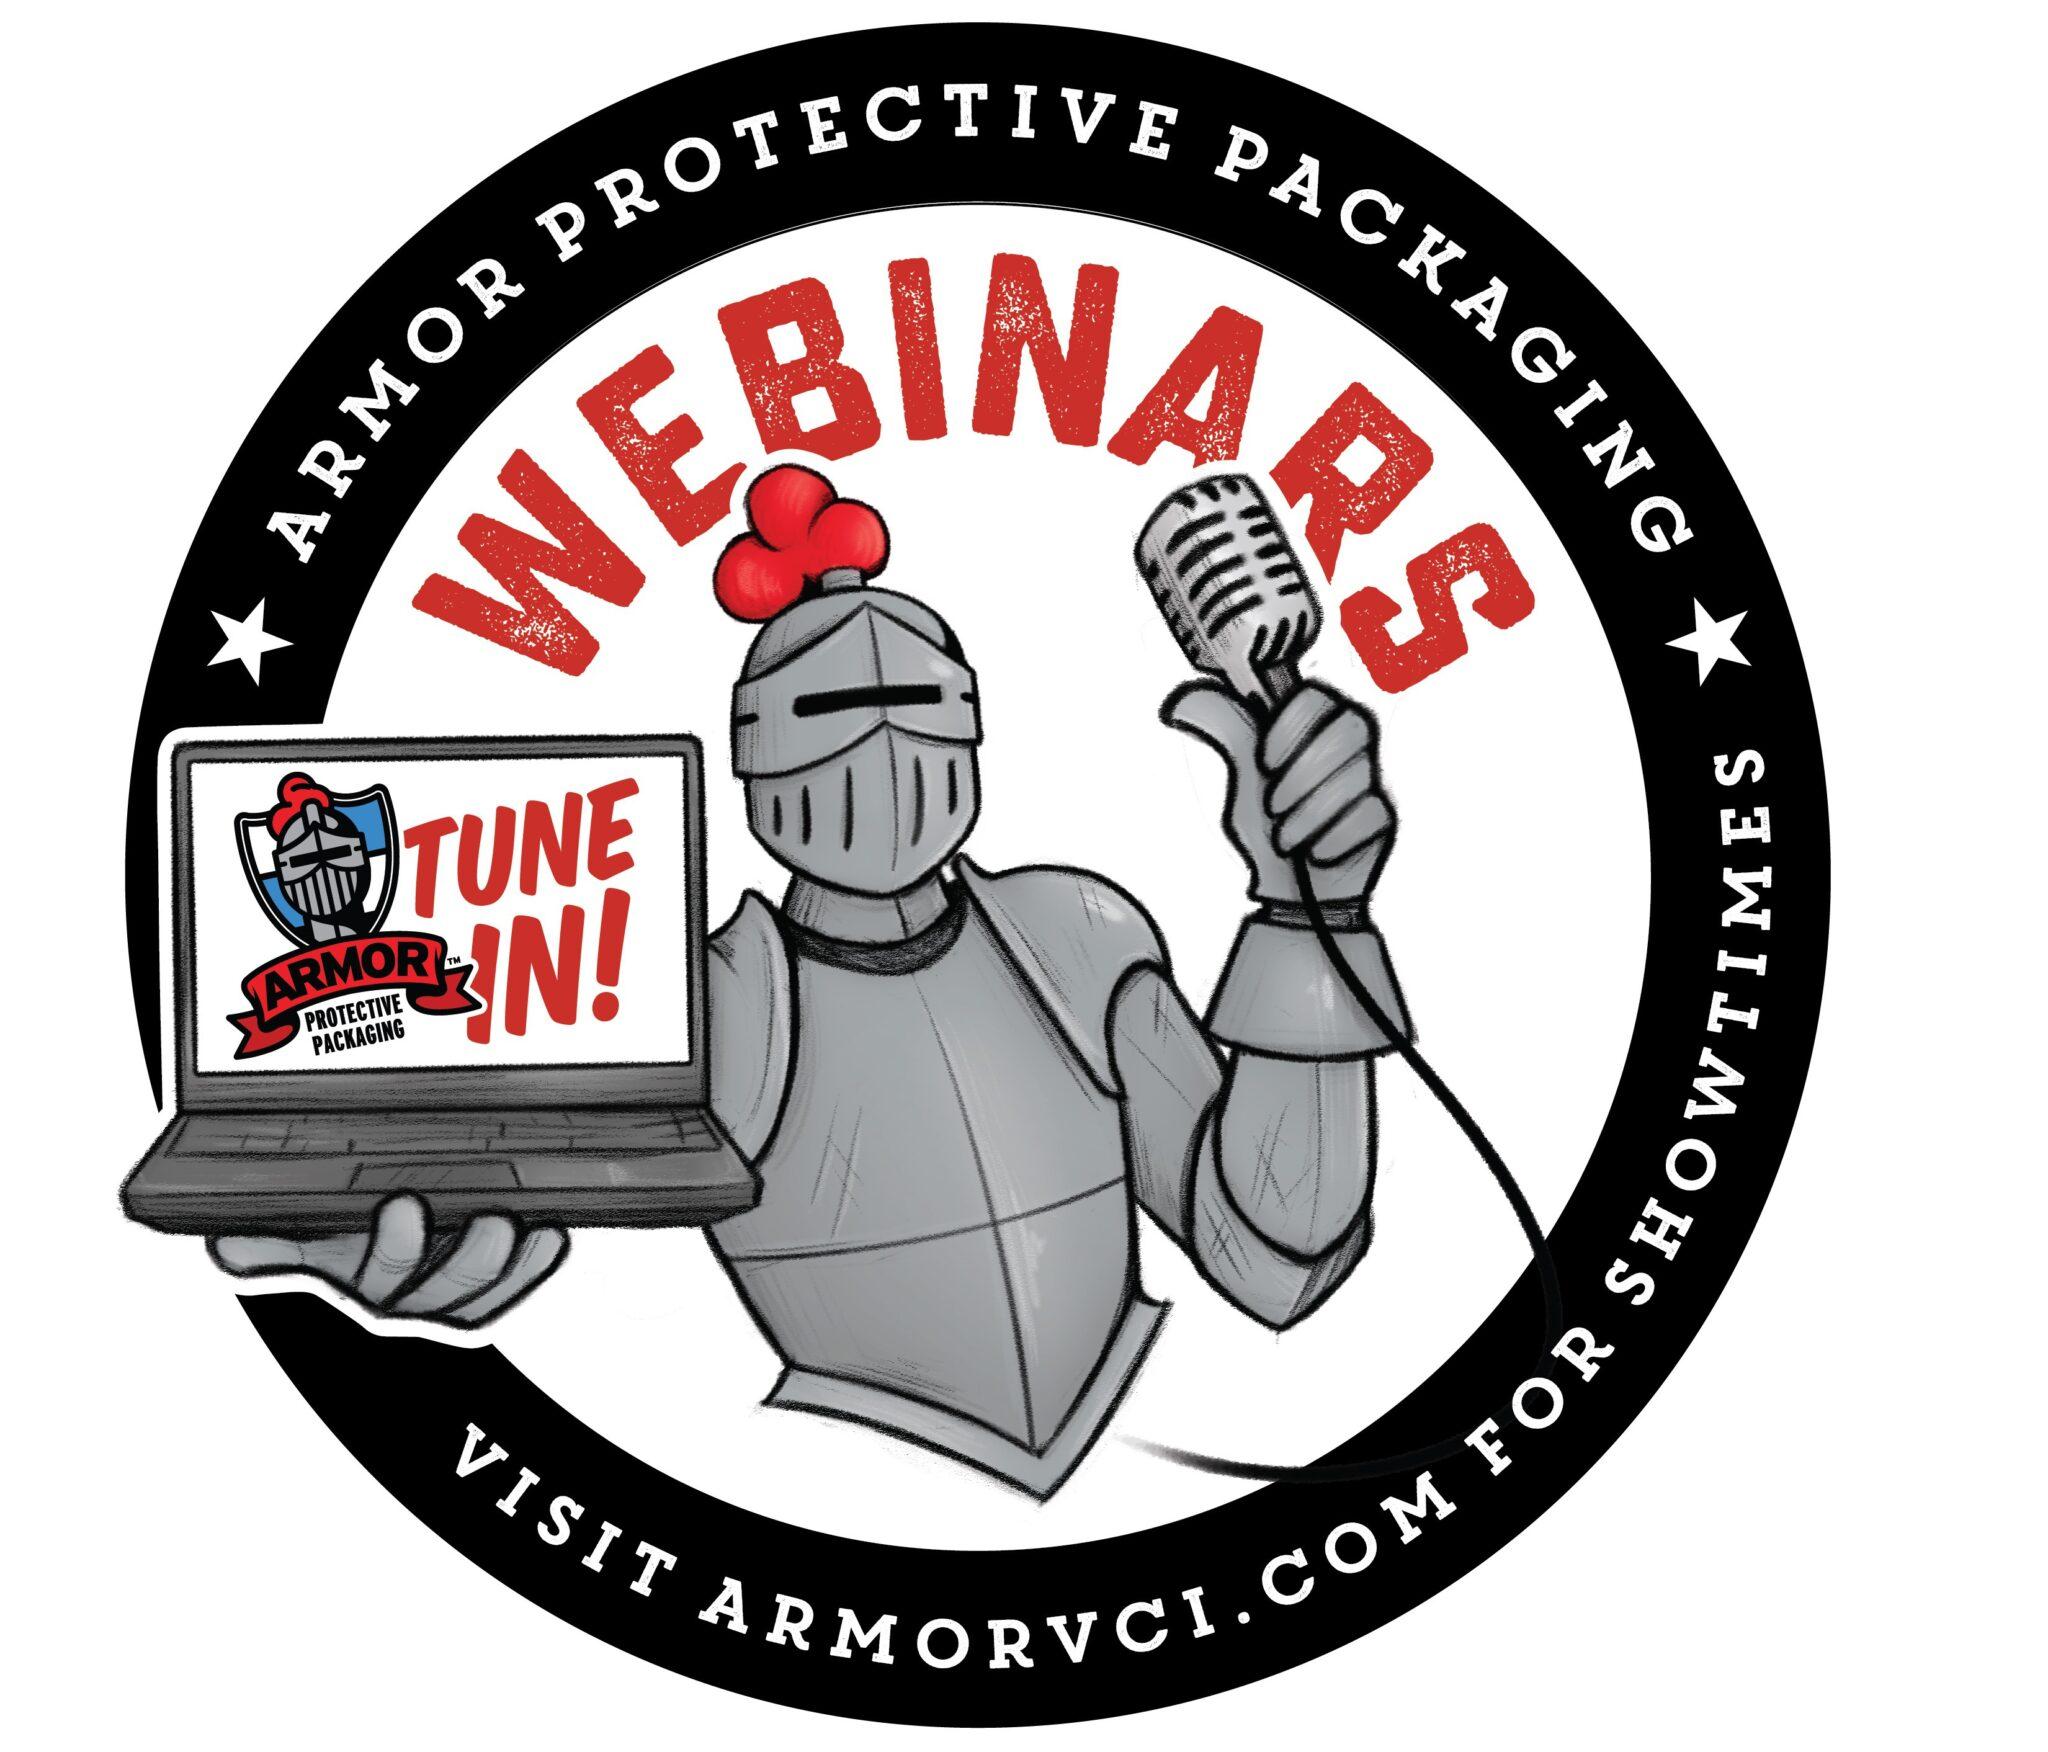 Armor Protective Packaging Webinar Logo